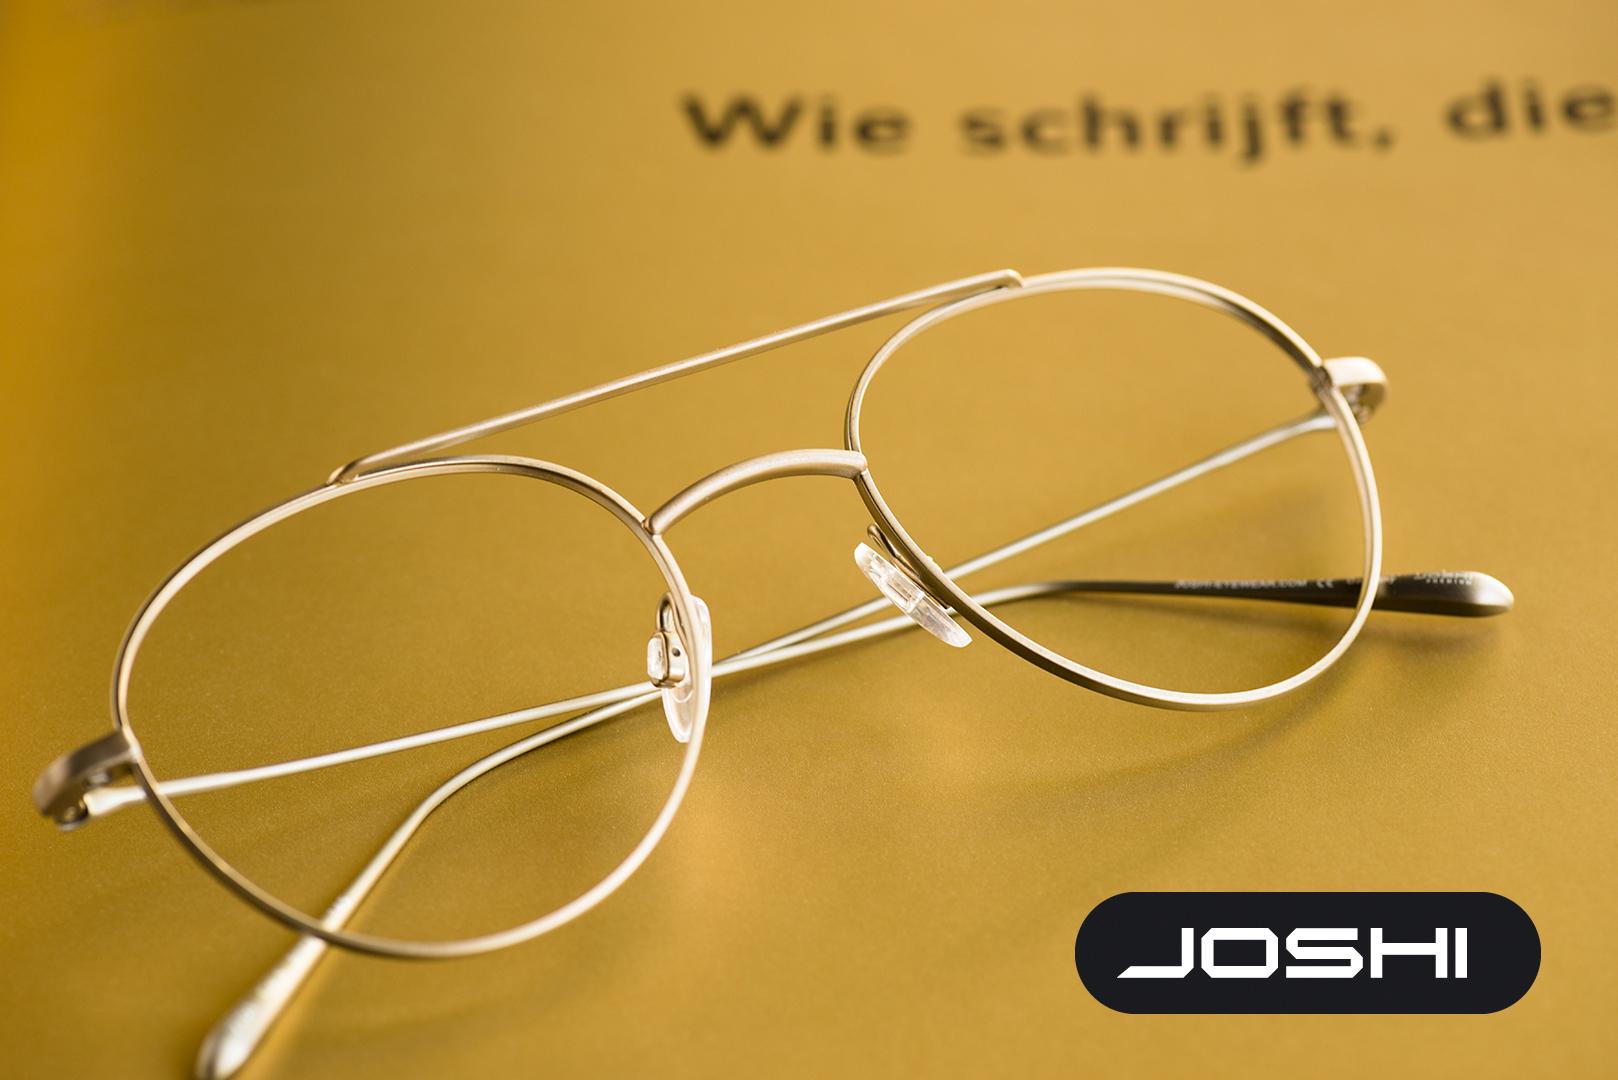 Joshi Eyewear by Kruytzer TREND EYES FW17-18_11.jpg